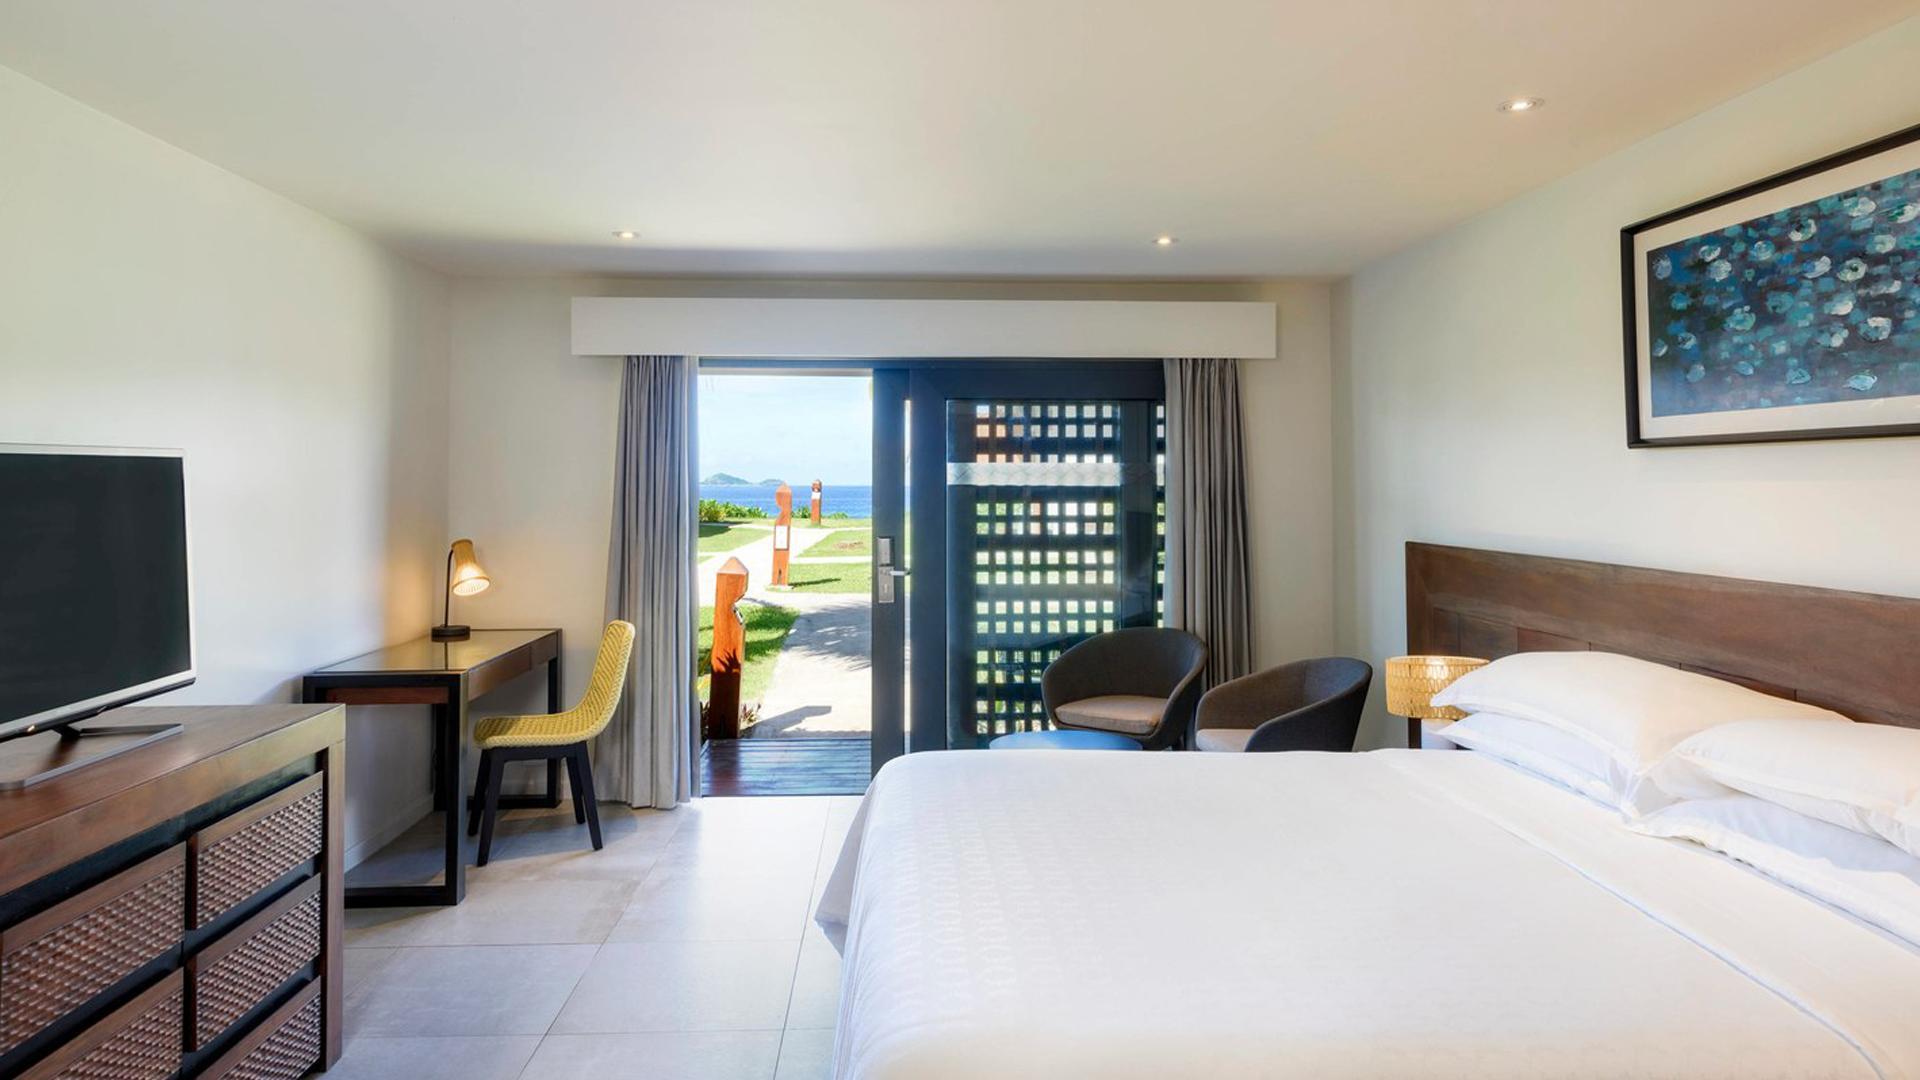 Ocean View image 1 at Sheraton Resort & Spa, Tokoriki Island, Fiji by null, null, Fiji